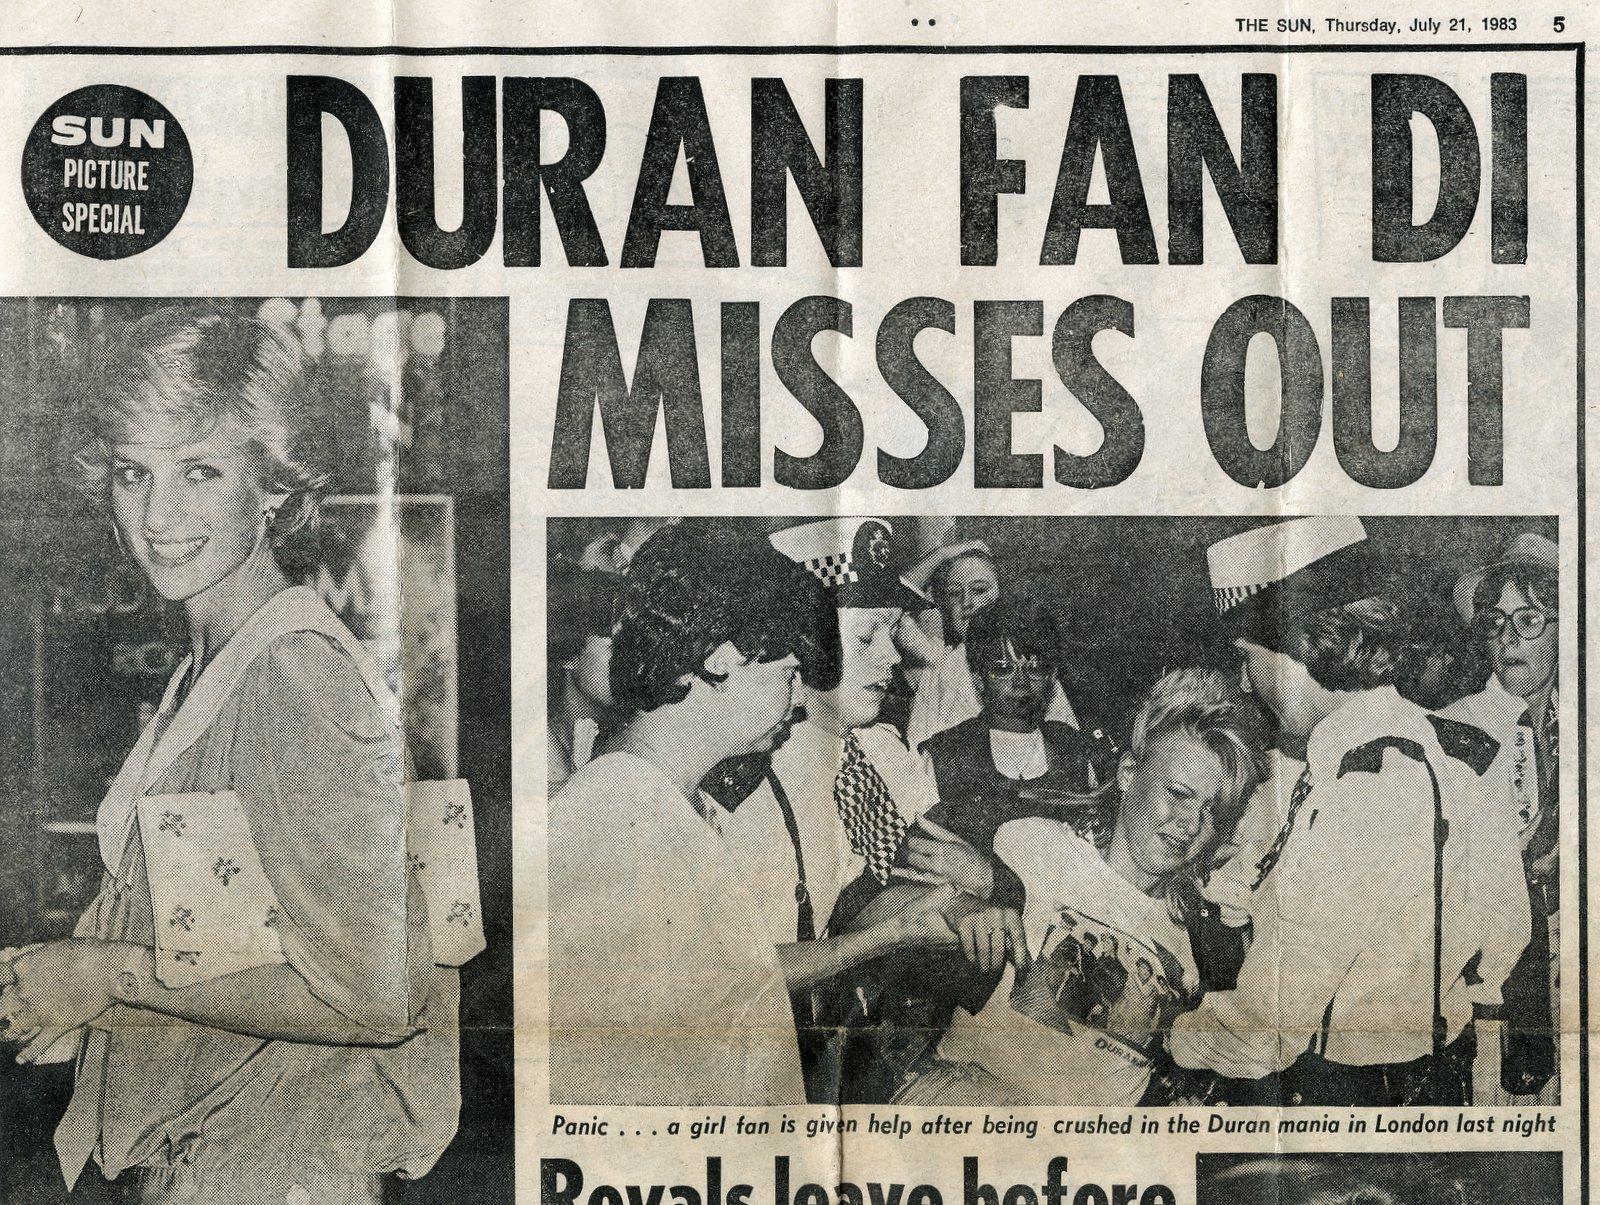 Princess Diana - Duran Duran fan - The Sun - July 21 1983 (2)